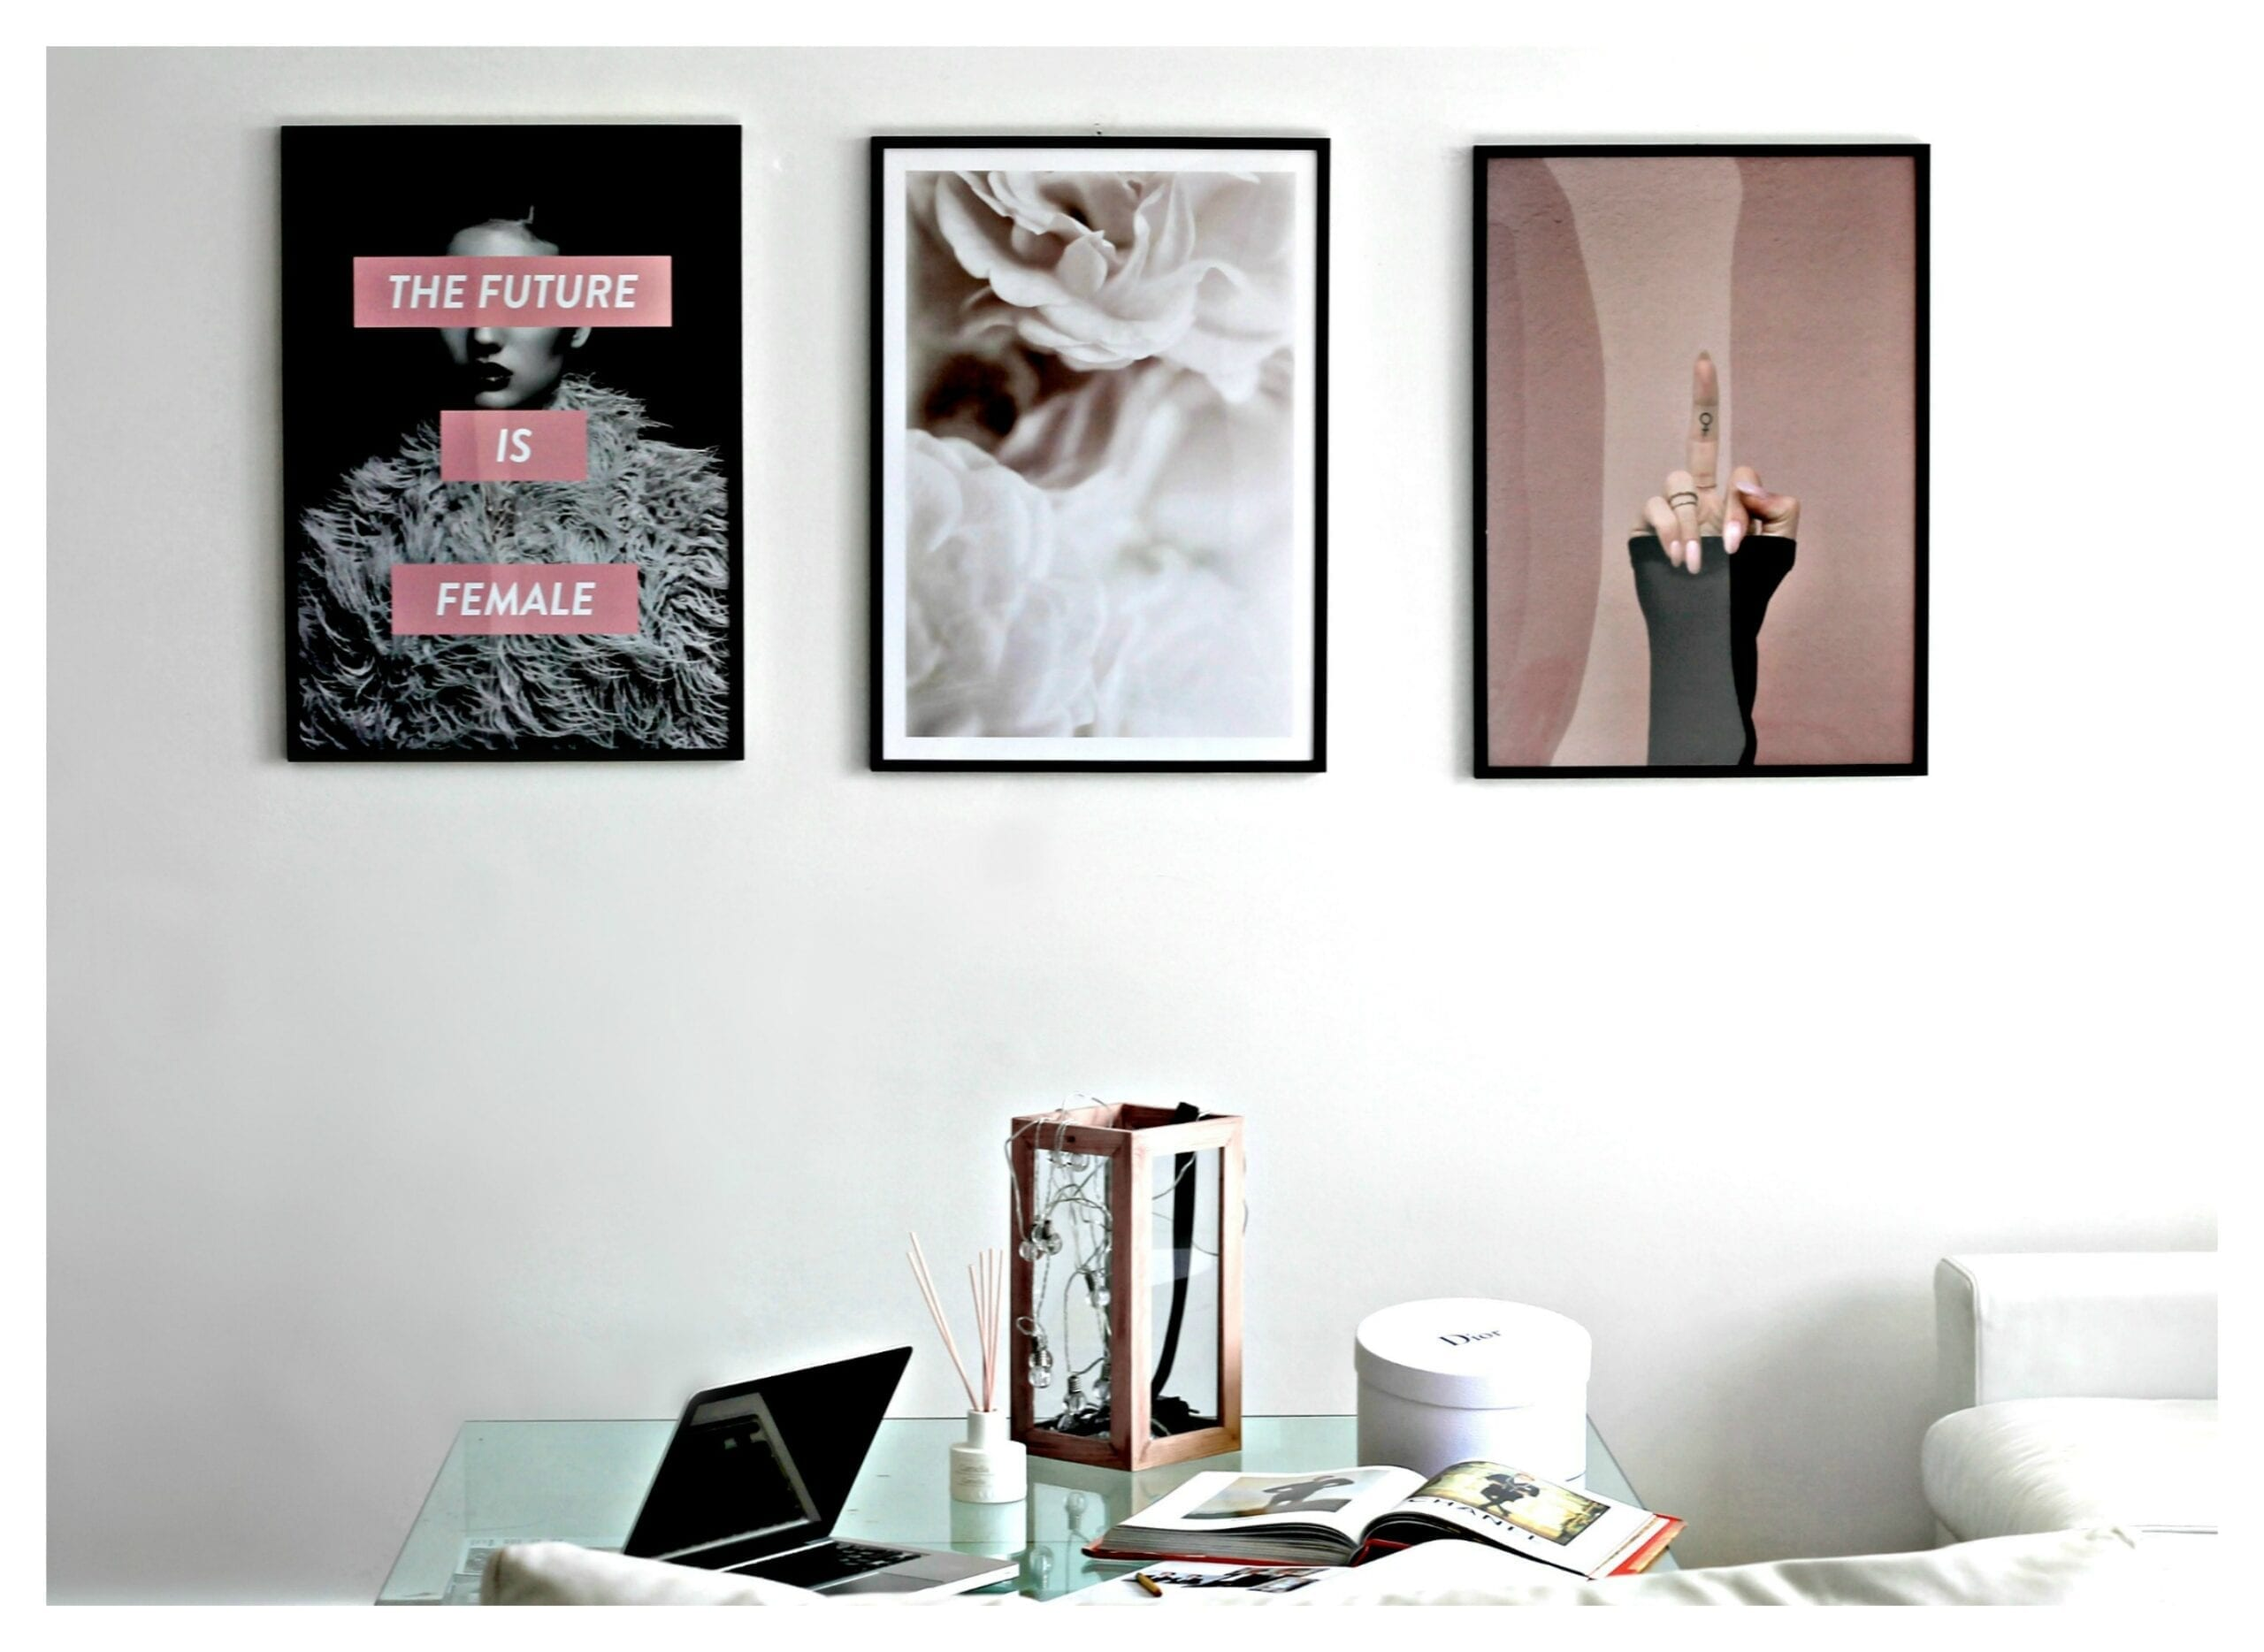 poster da parete, stampe moda parete, stampe desenio, stampe parete desenio, stile minimal arredamento, casa stile scandinavo arredamento, theladycracy.it, elisa bellino, poster belli parete